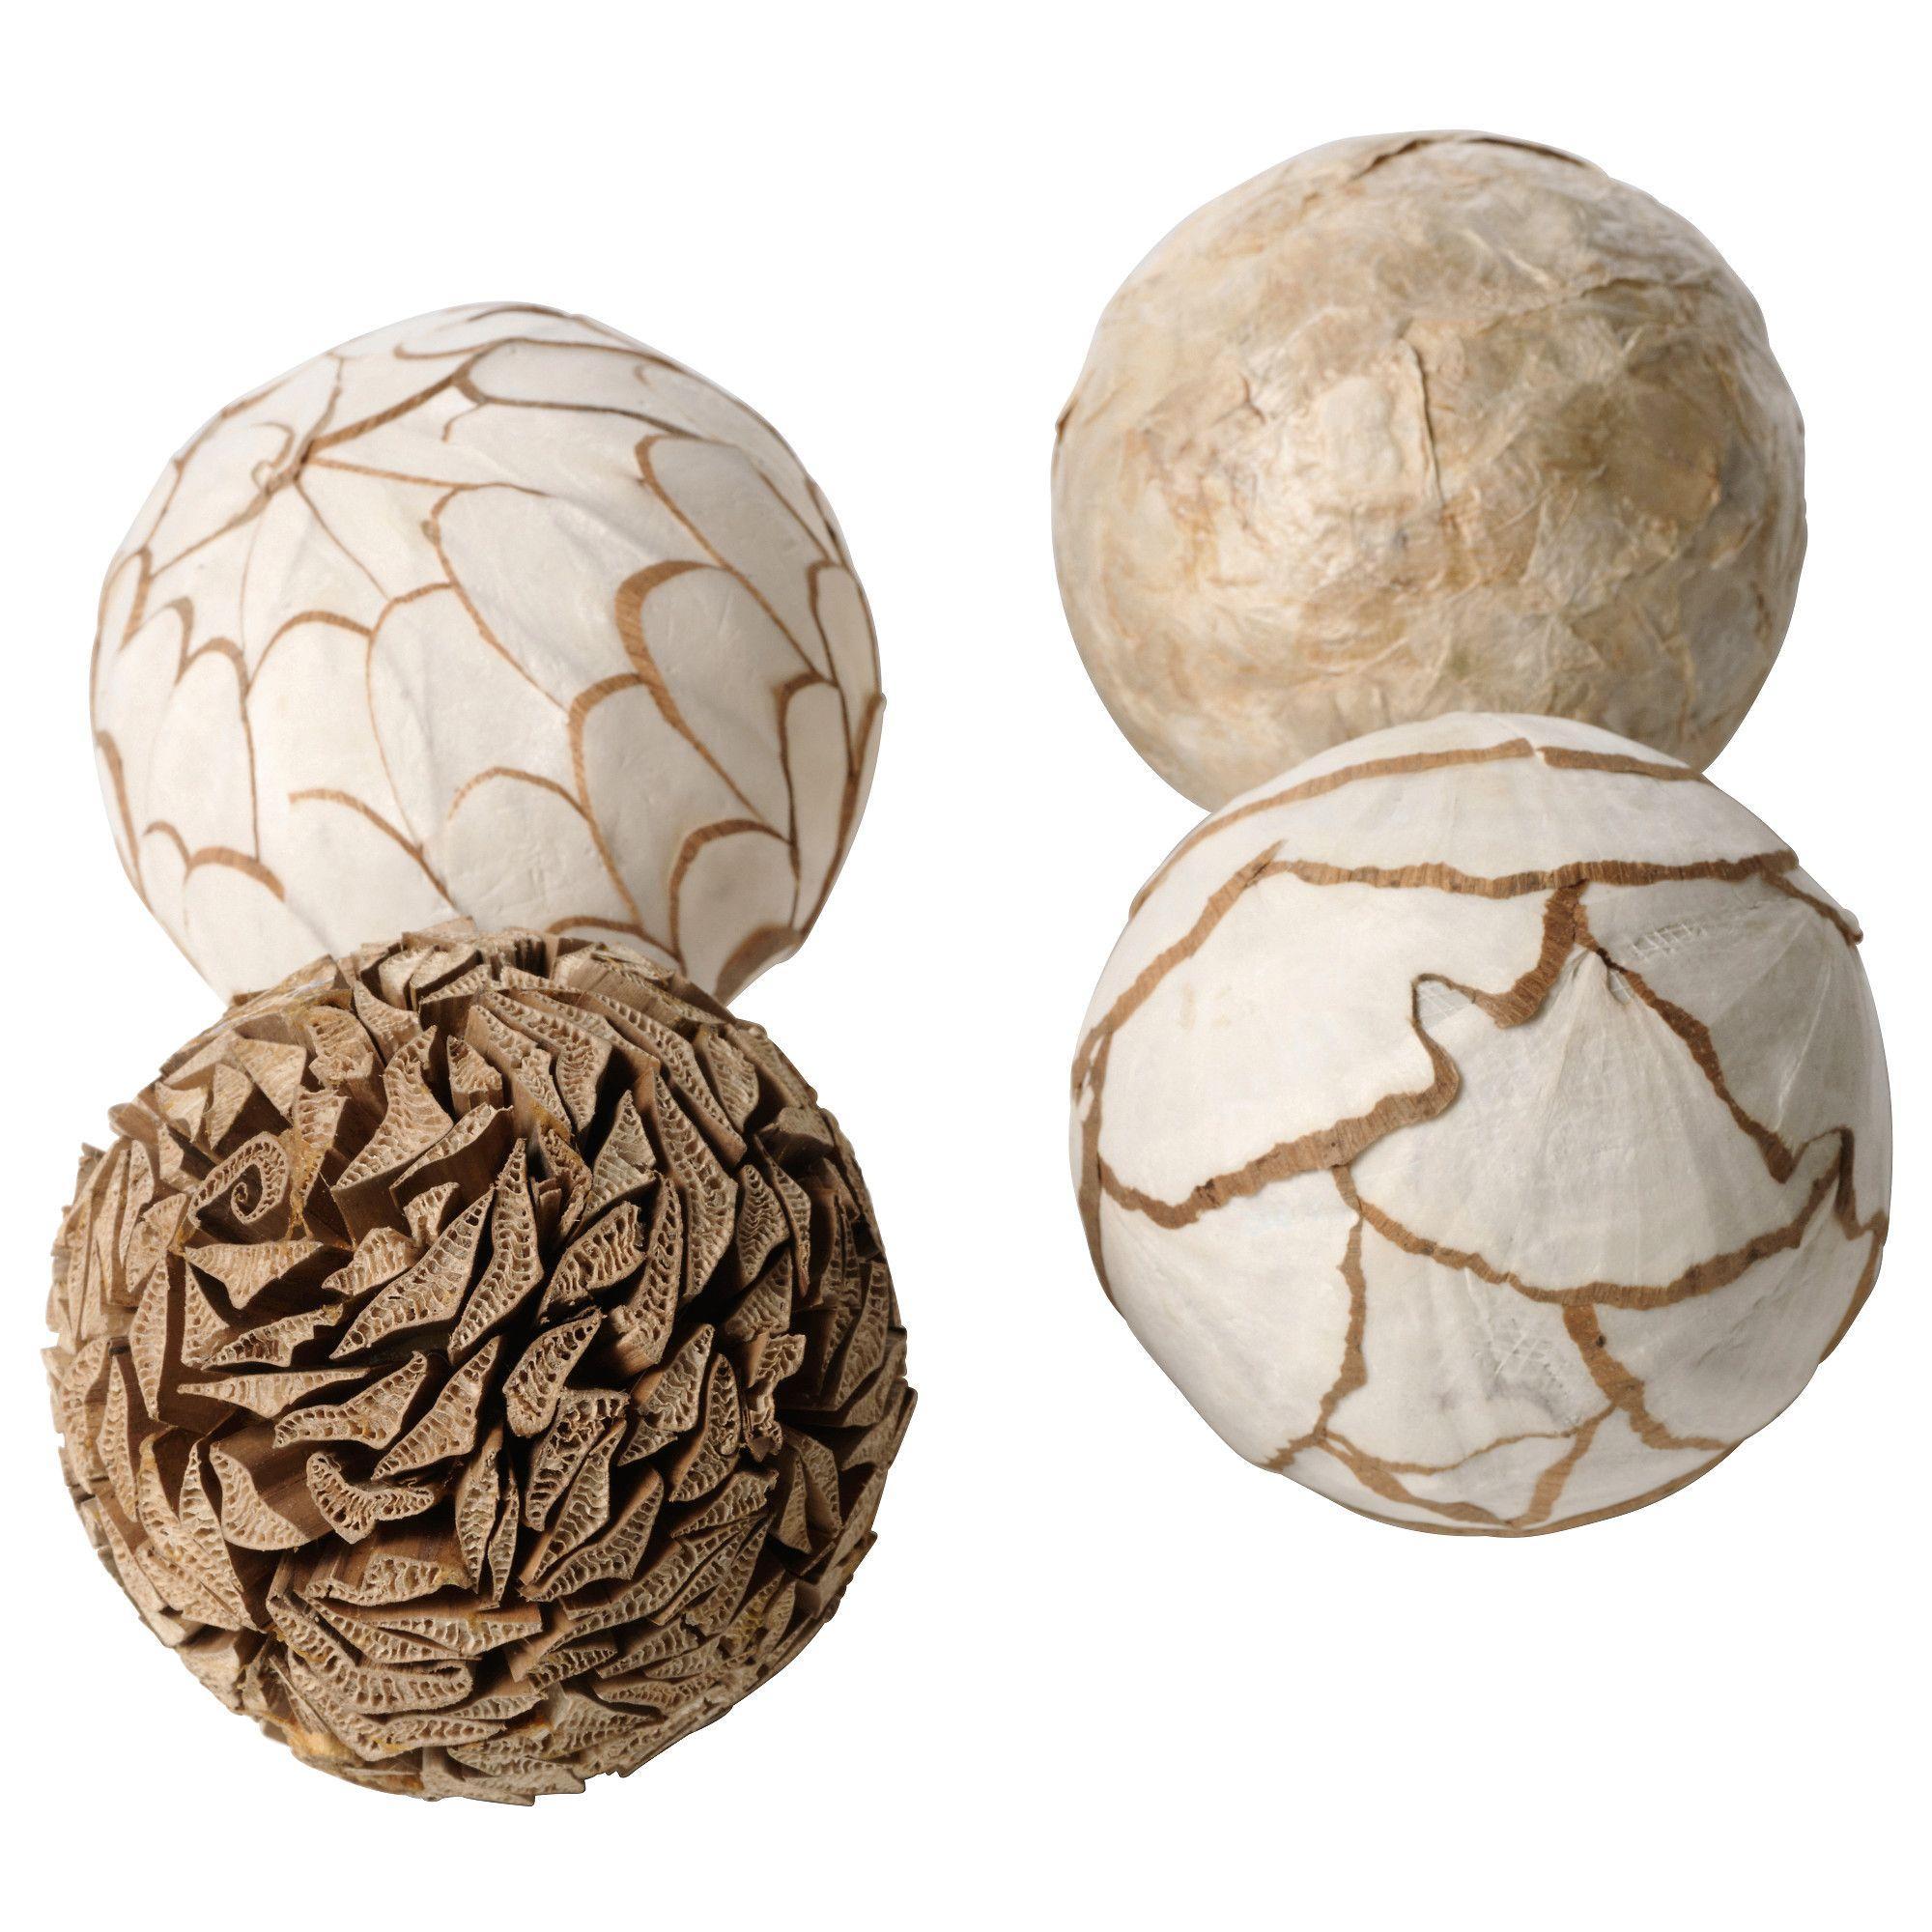 Decorative Balls For Bowls Ikea  Somlig Decoration Ball You Can Arrange The Decorative